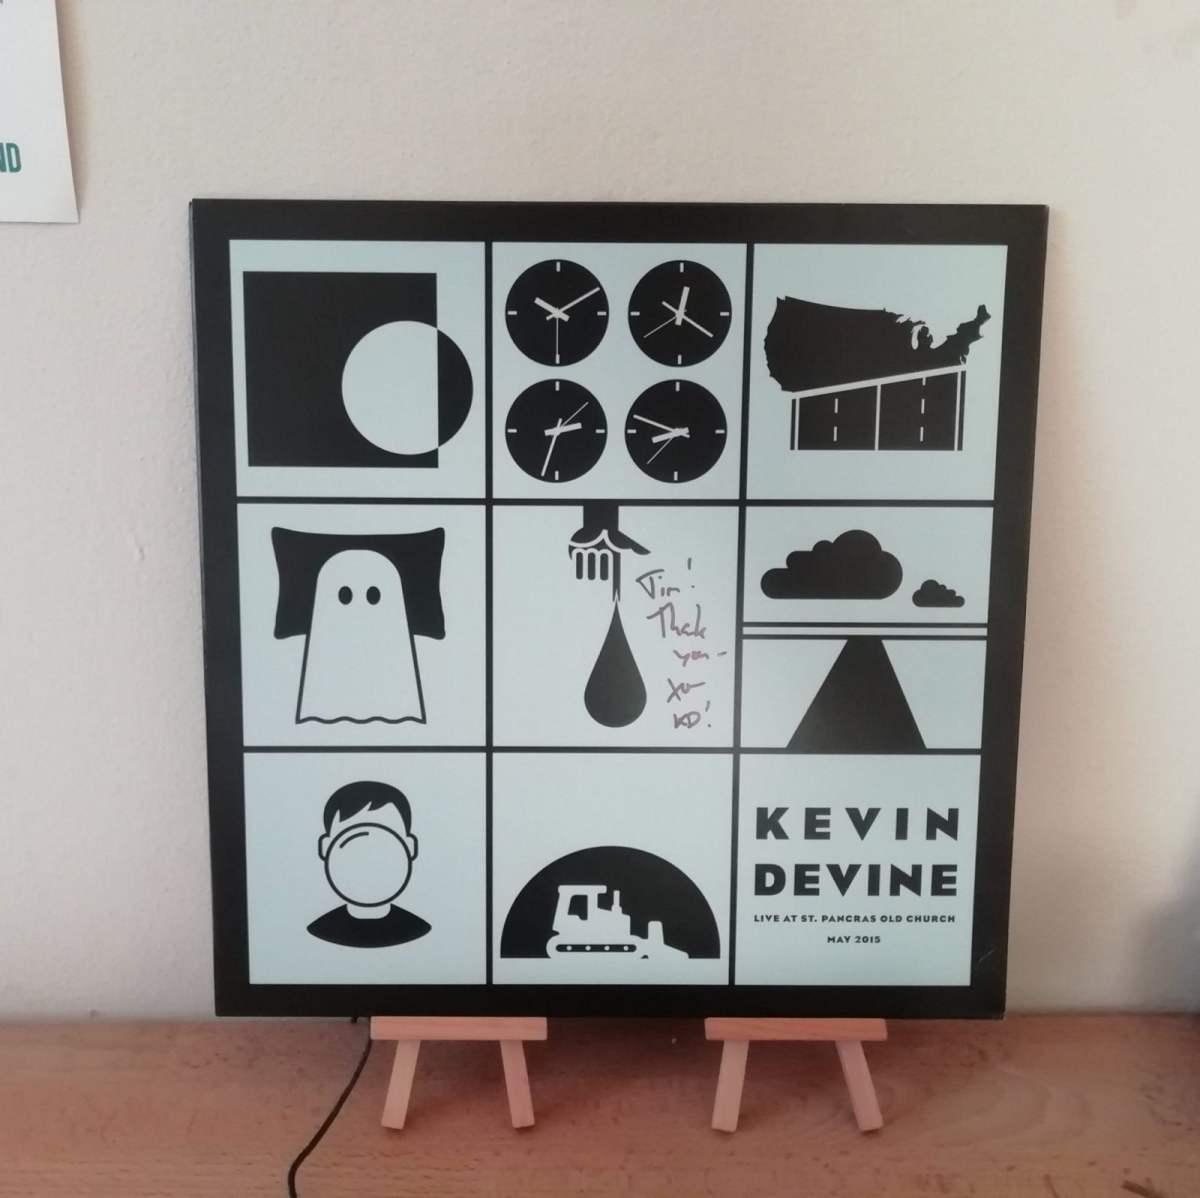 Kevin Devine - Starter for Ten 2